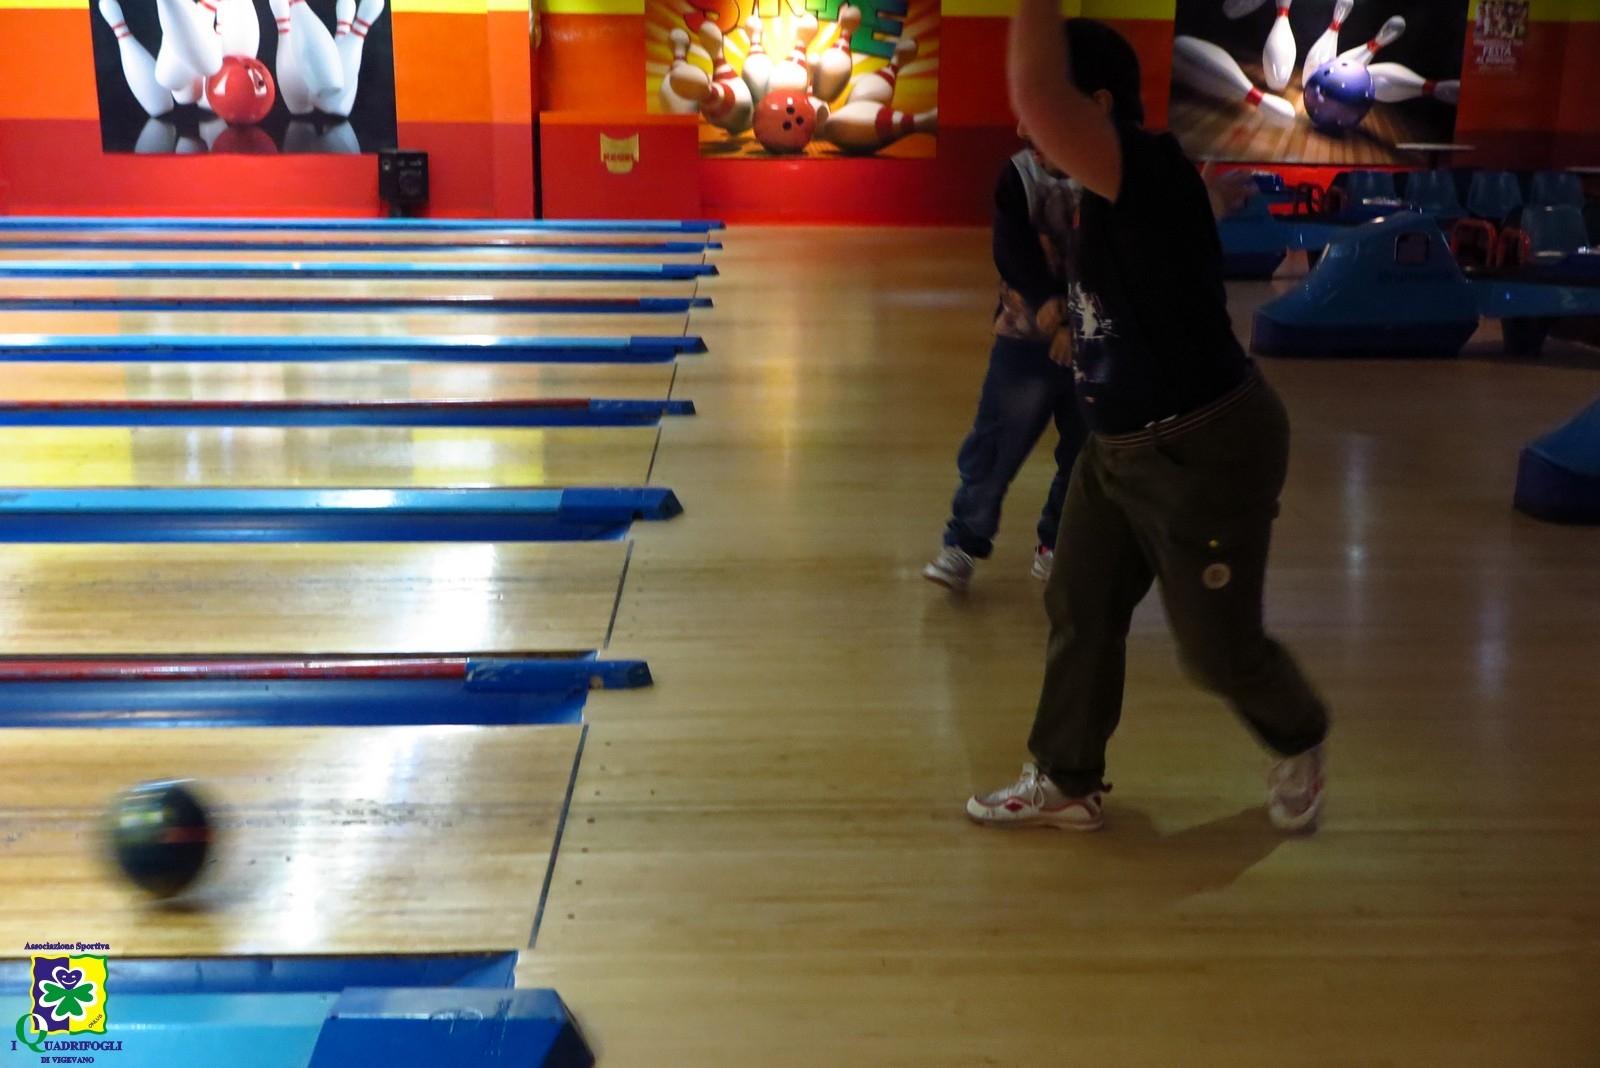 Torneo Bowling Vigevano 19-12-2018 - 013